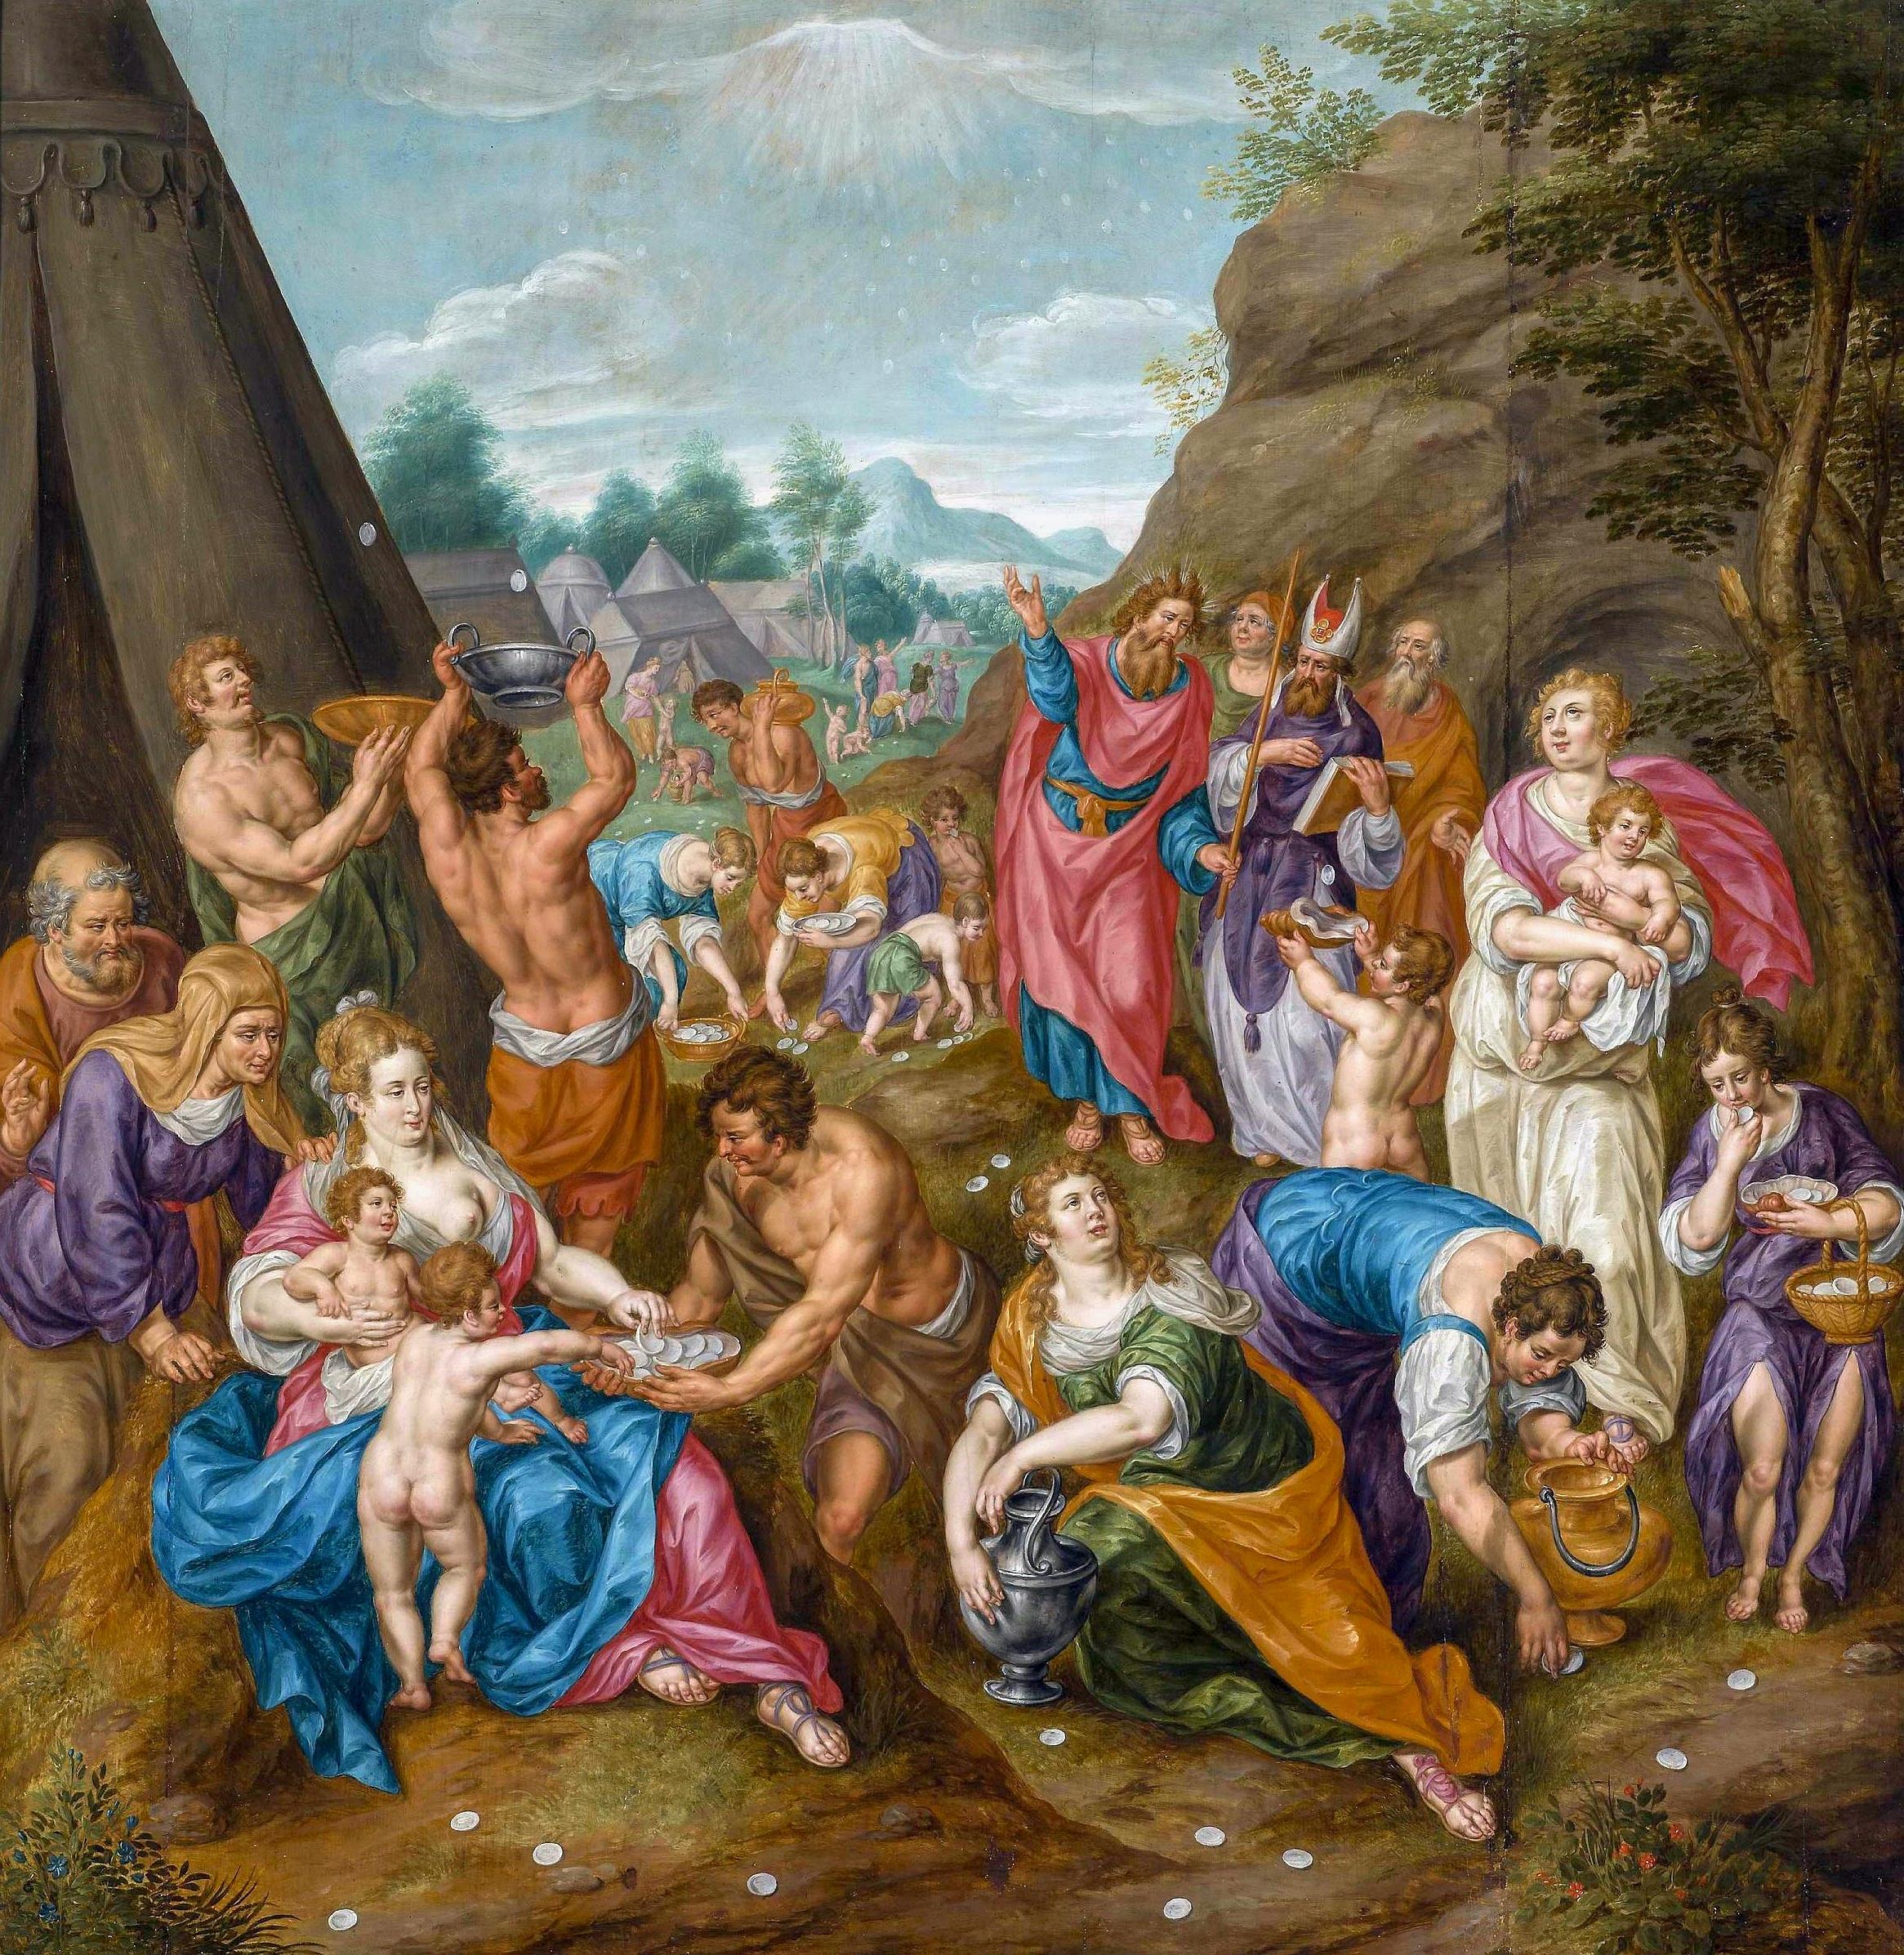 Fichier:Clerck Israelites gathering Manna.jpg — Wikipédia